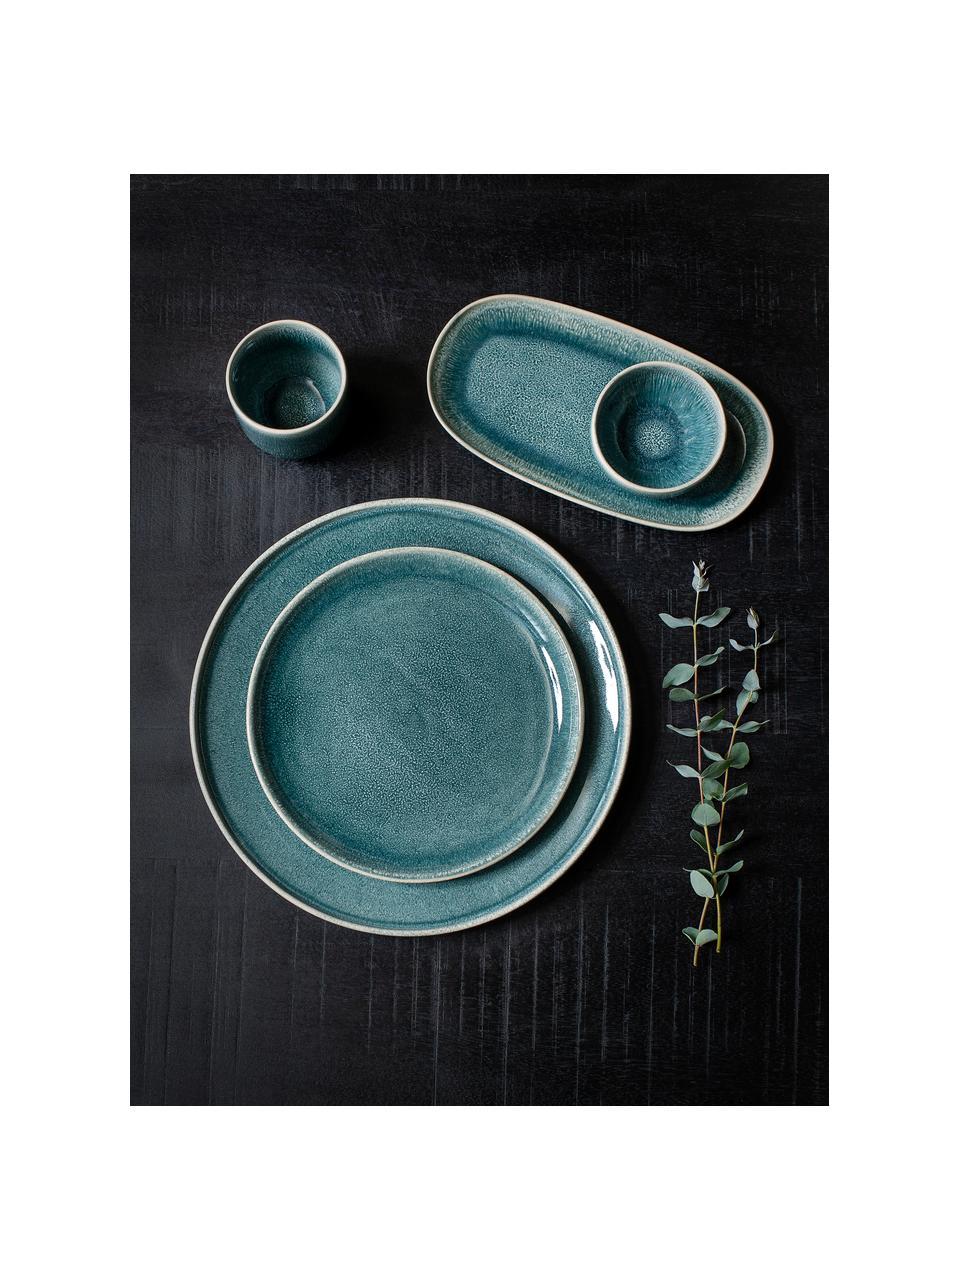 Steingut Becher Audrey, 2 Stück, Steingut, Grün-Blau, Ø 8 x H 9 cm